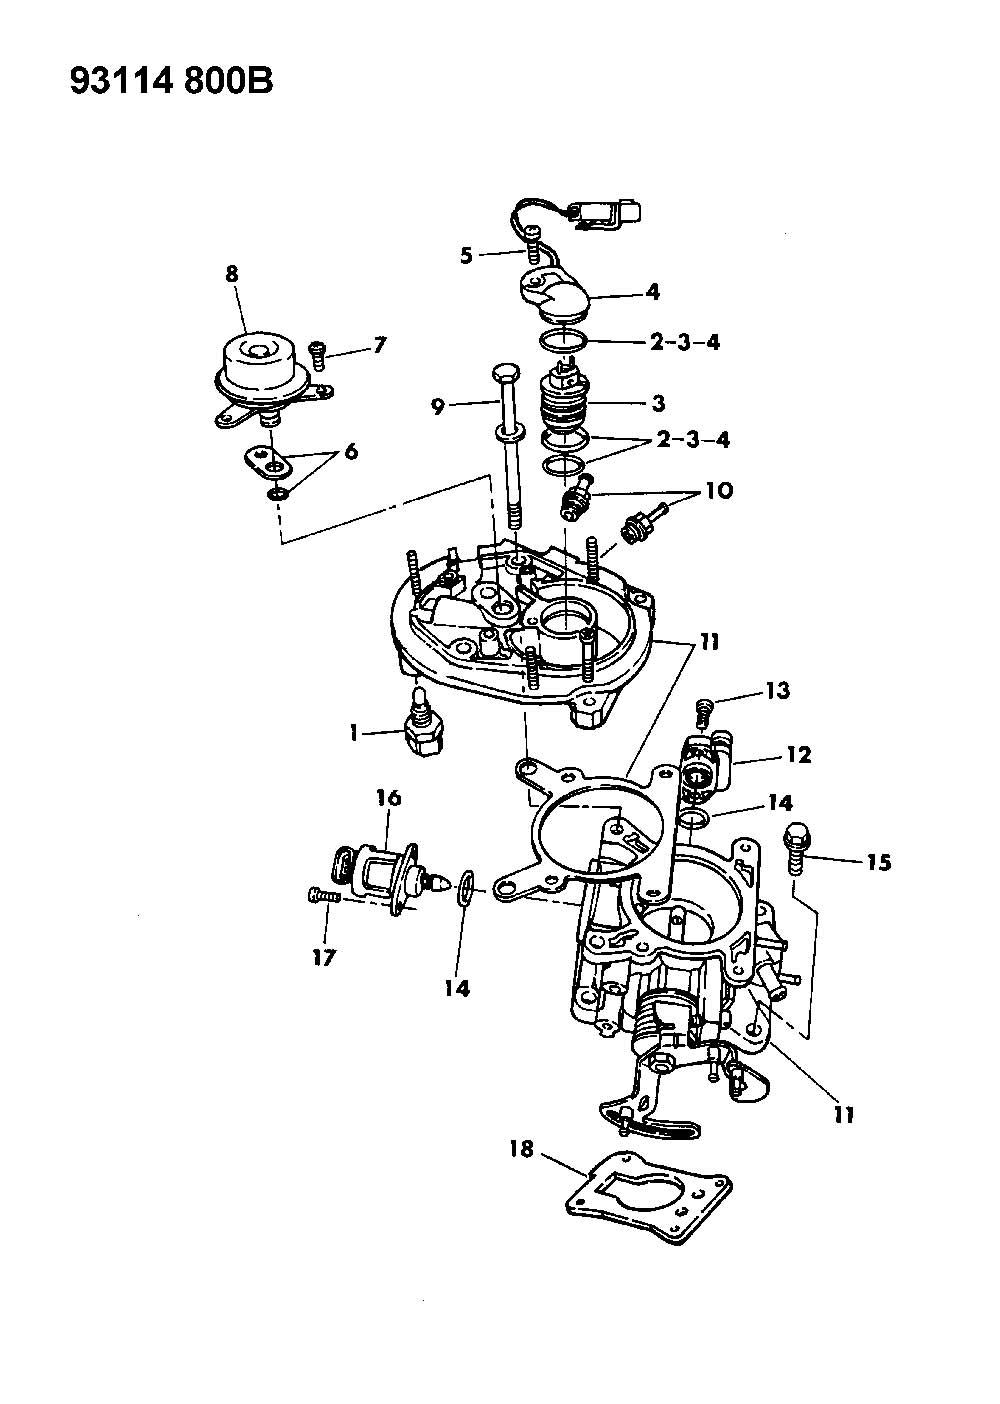 NEW Genuine MOPAR 04418911 Fuel Injector for Lebaron Grand